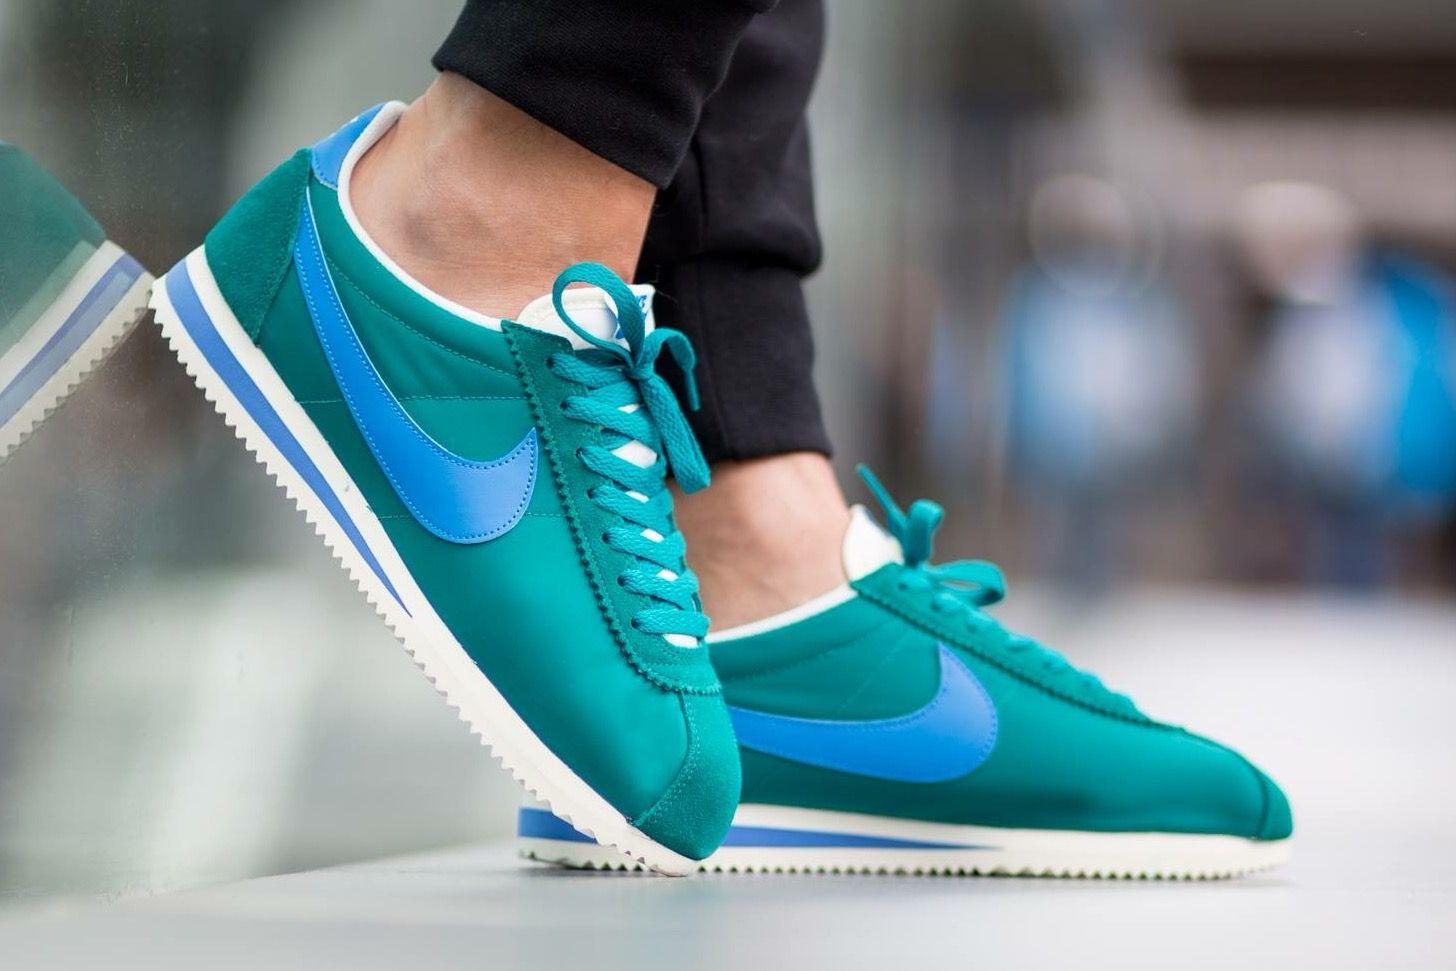 Nike Cortez | Nike cortez, Nike, Cortez